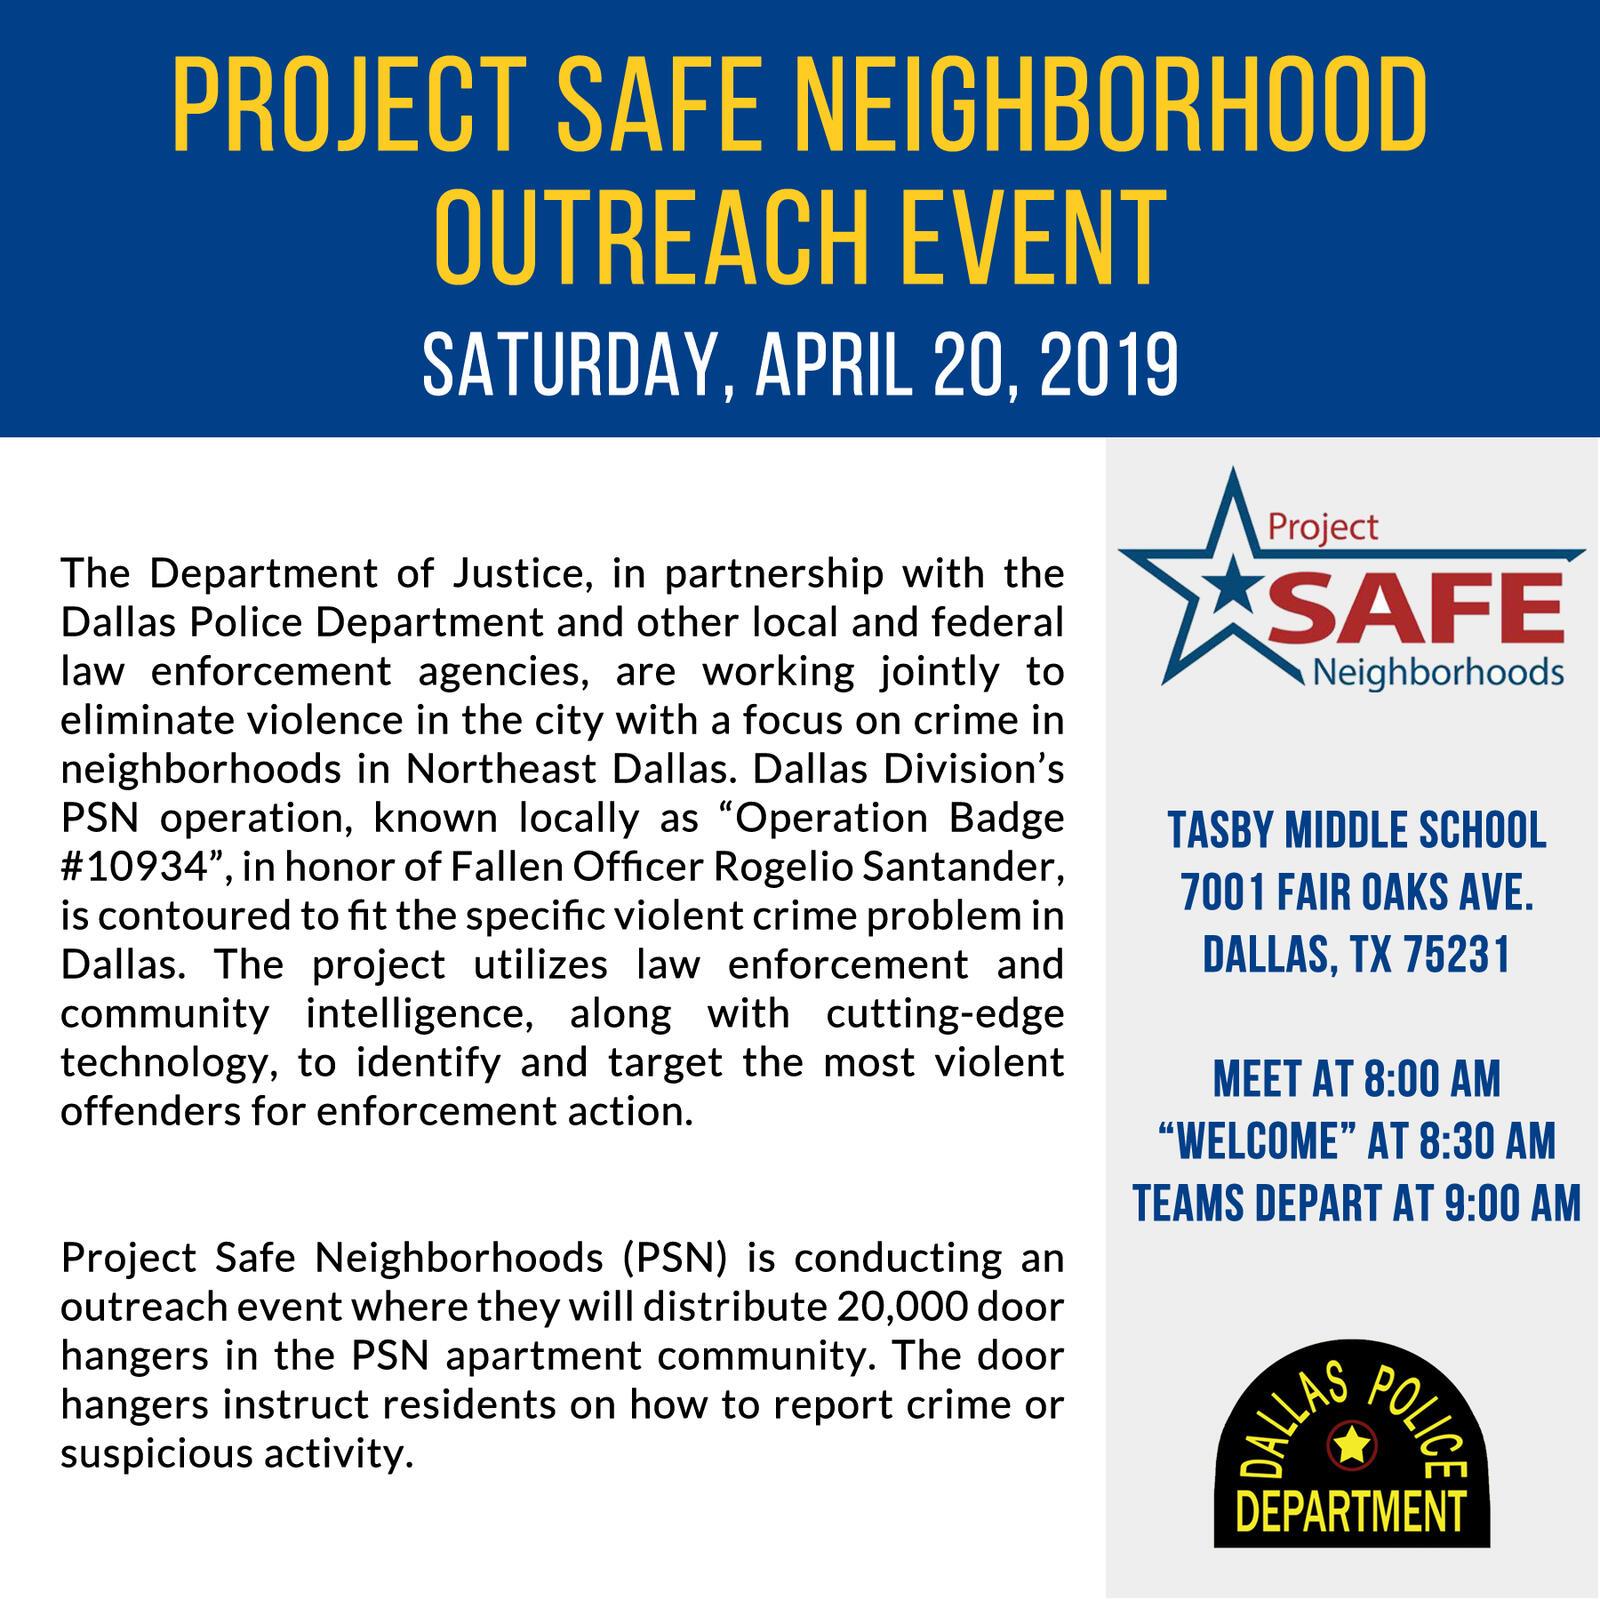 Project Safe Neighborhood Outreach Event (Dallas Police